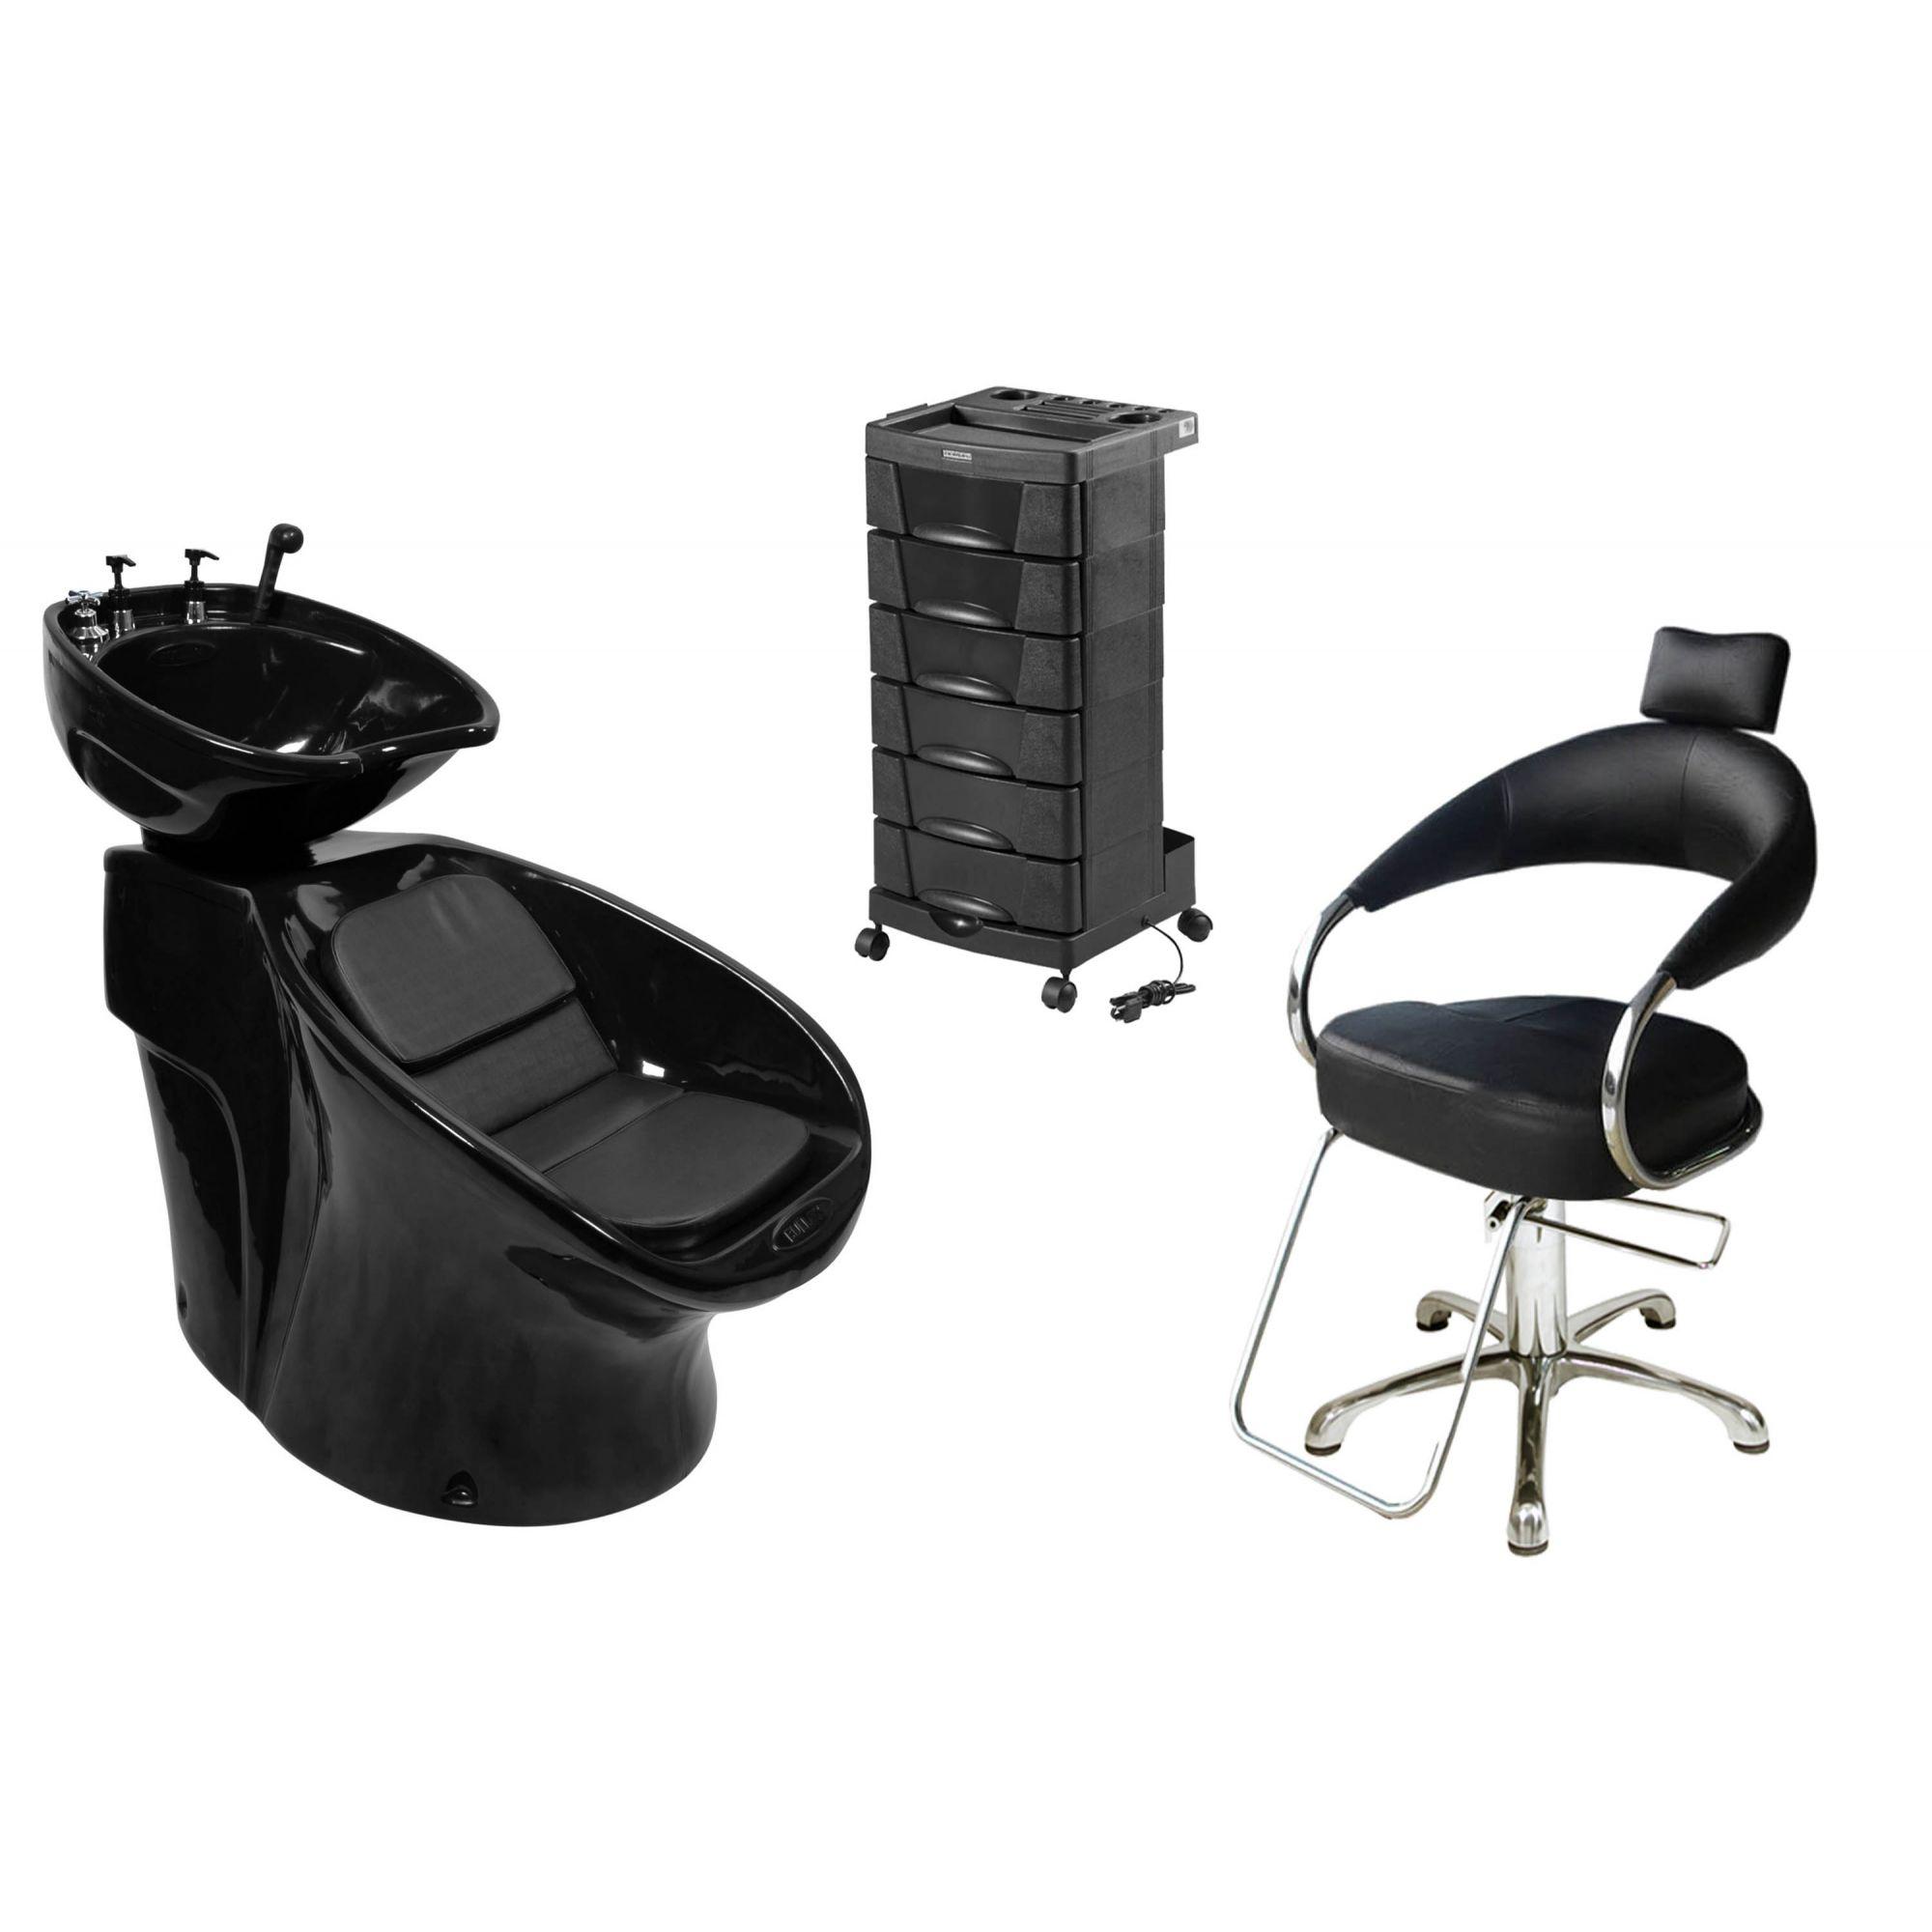 Lavatório Neon Shampoo + Cadeira Hidráulica Futurama + Beauty